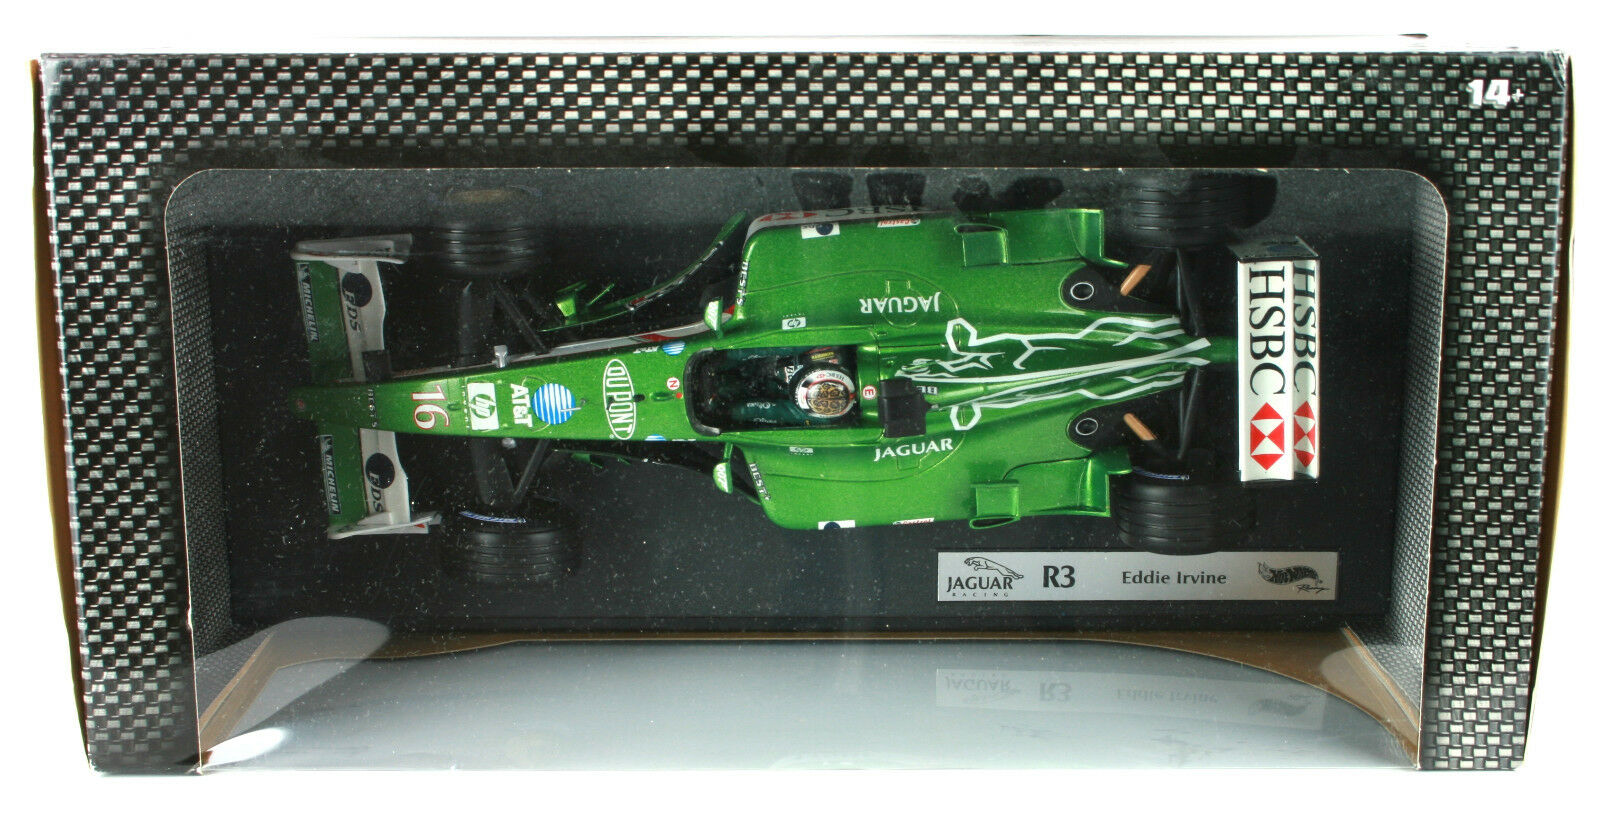 EDDIE EDDIE EDDIE IRVINE JAGUAR R3 2002 HOT WHEELS 1 18th F1 scale model voiture 24b7e0